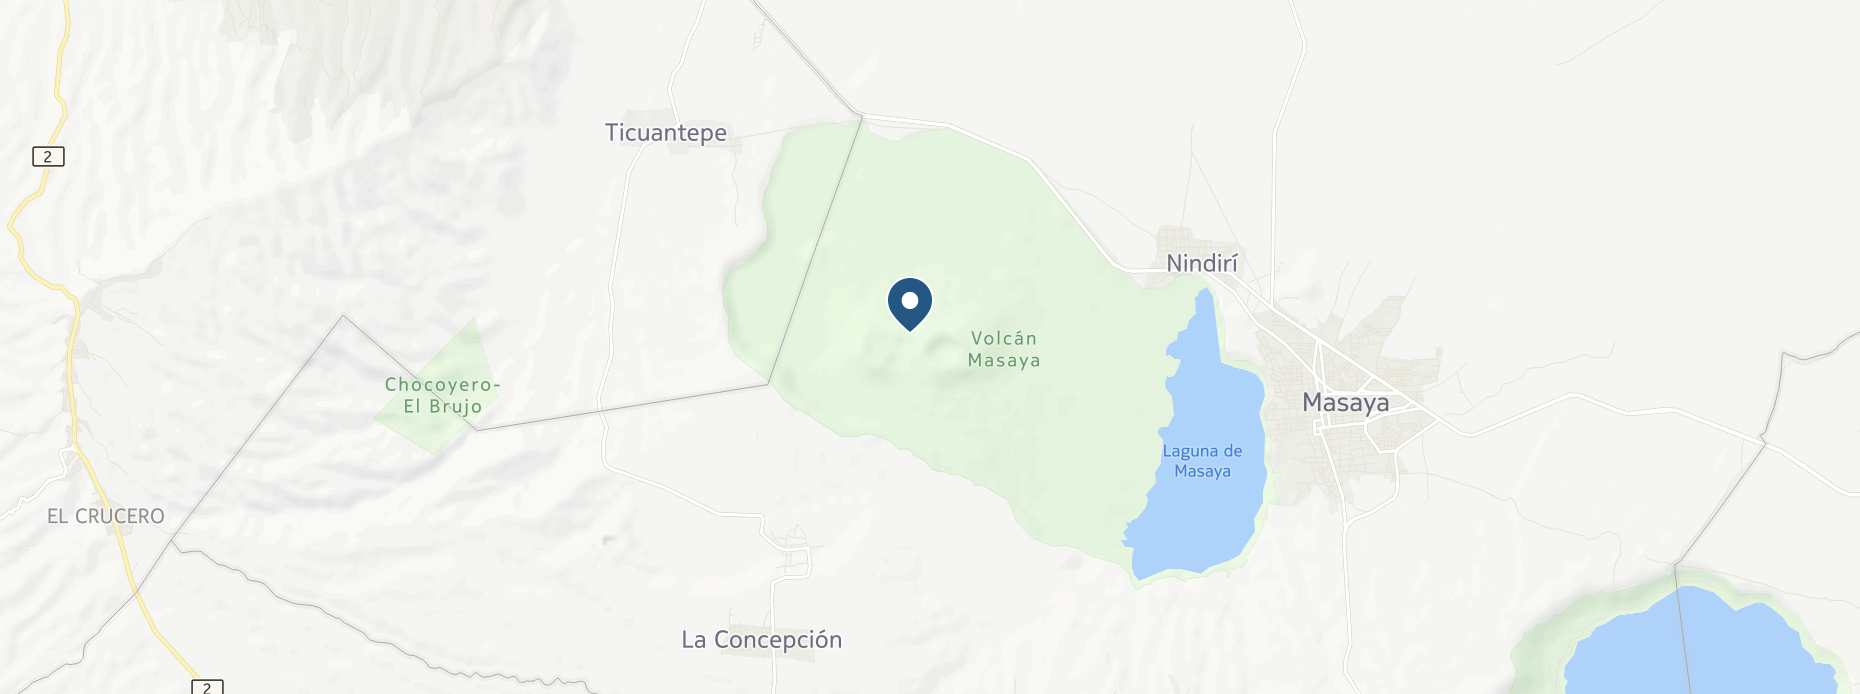 Volcan Masaya Map